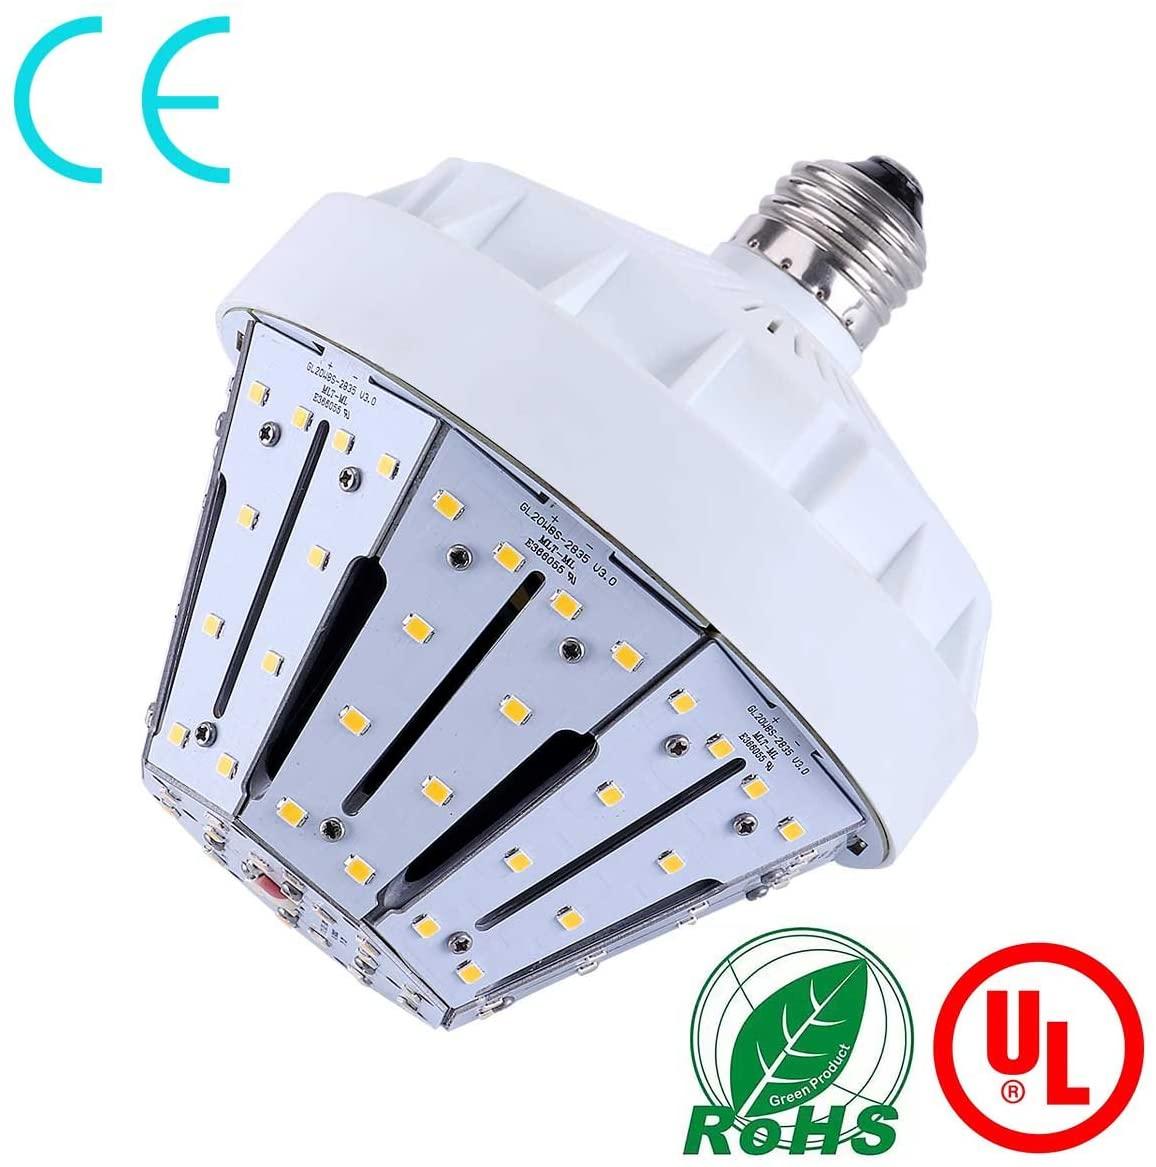 20 Watt(200 Watt Equivalent) LED Corn Bulb,3300 Lumen 5000K,Cool Daylight White LED Street & Area Light,E26 Medium Base,for Outdoor Garage Warehouse High Bay Barn Backyard,Super Bright